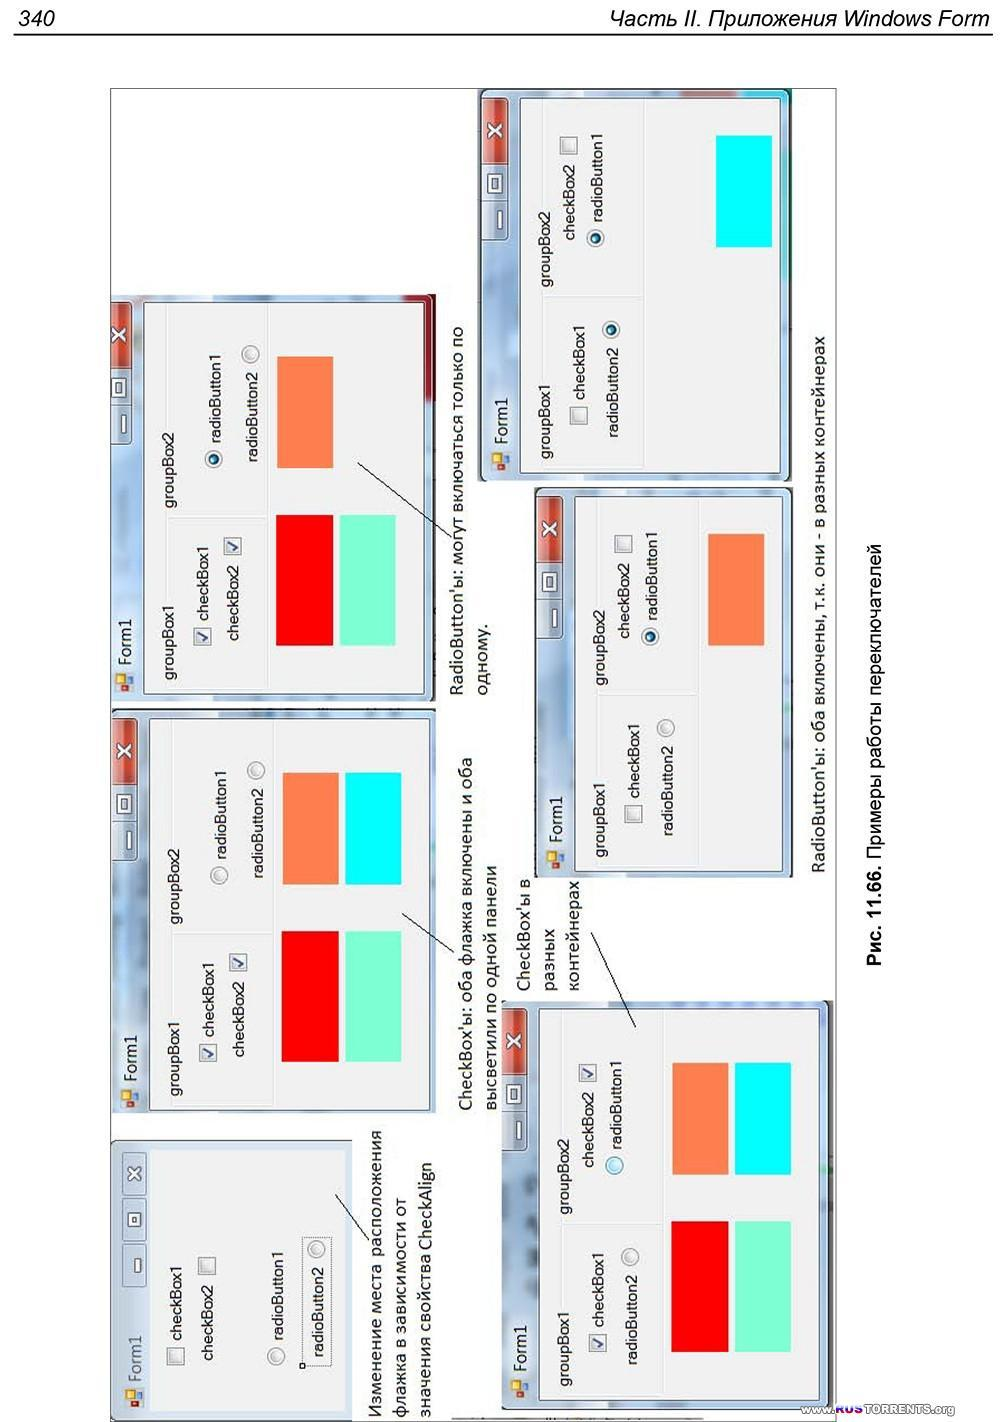 Борис Пахомов - С/С++ и MS Visual C++ 2012 для начинающих | PDF